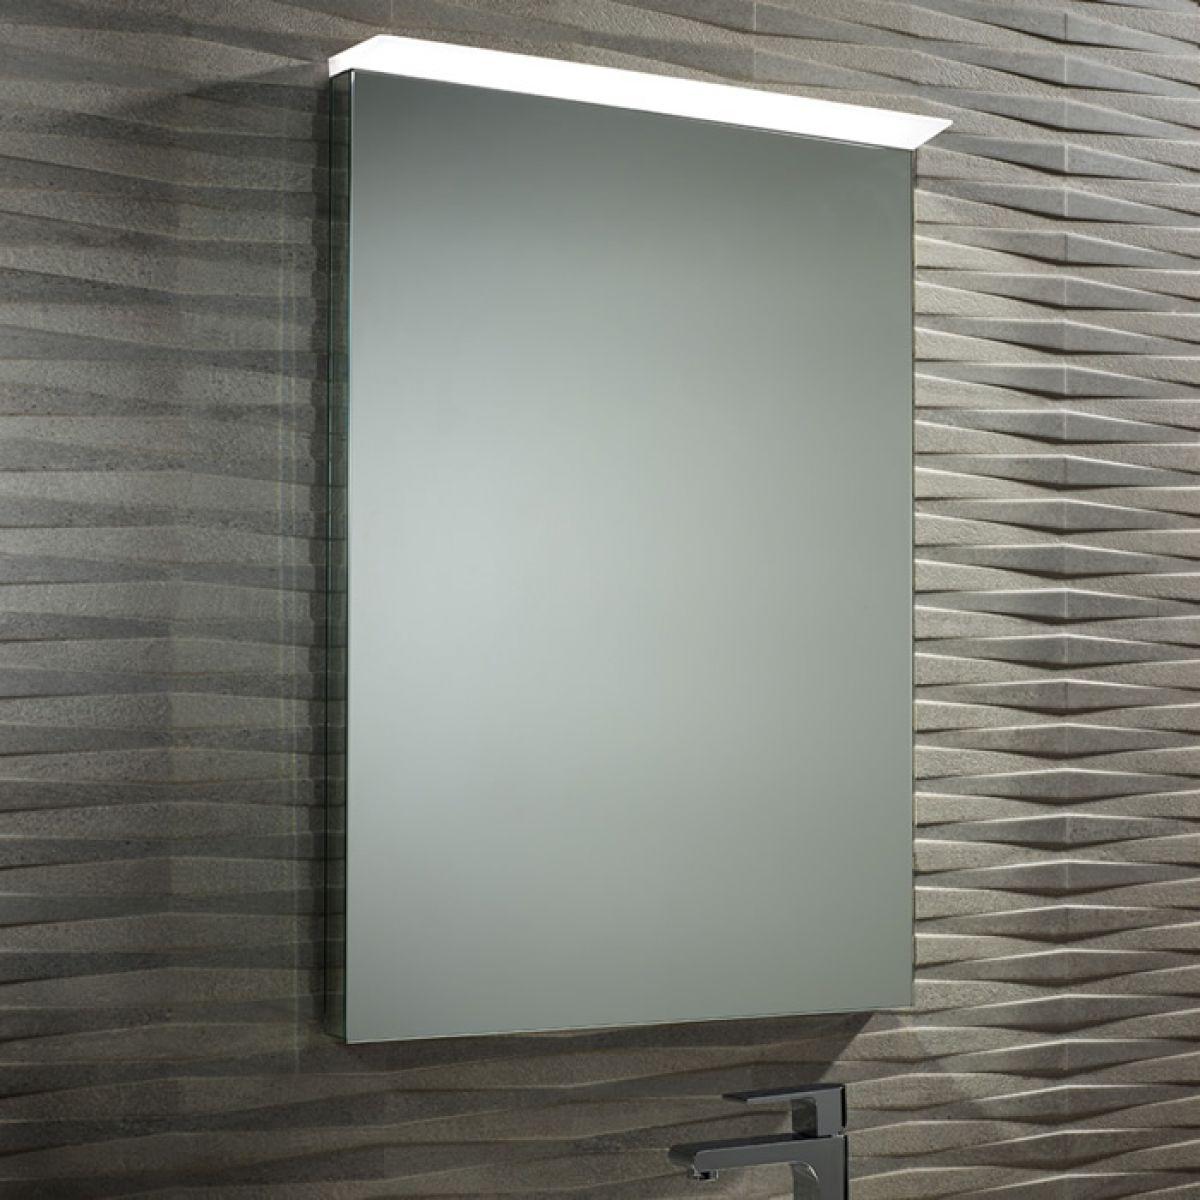 Roper Rhodes Induct Illuminated Mirror - MLE440